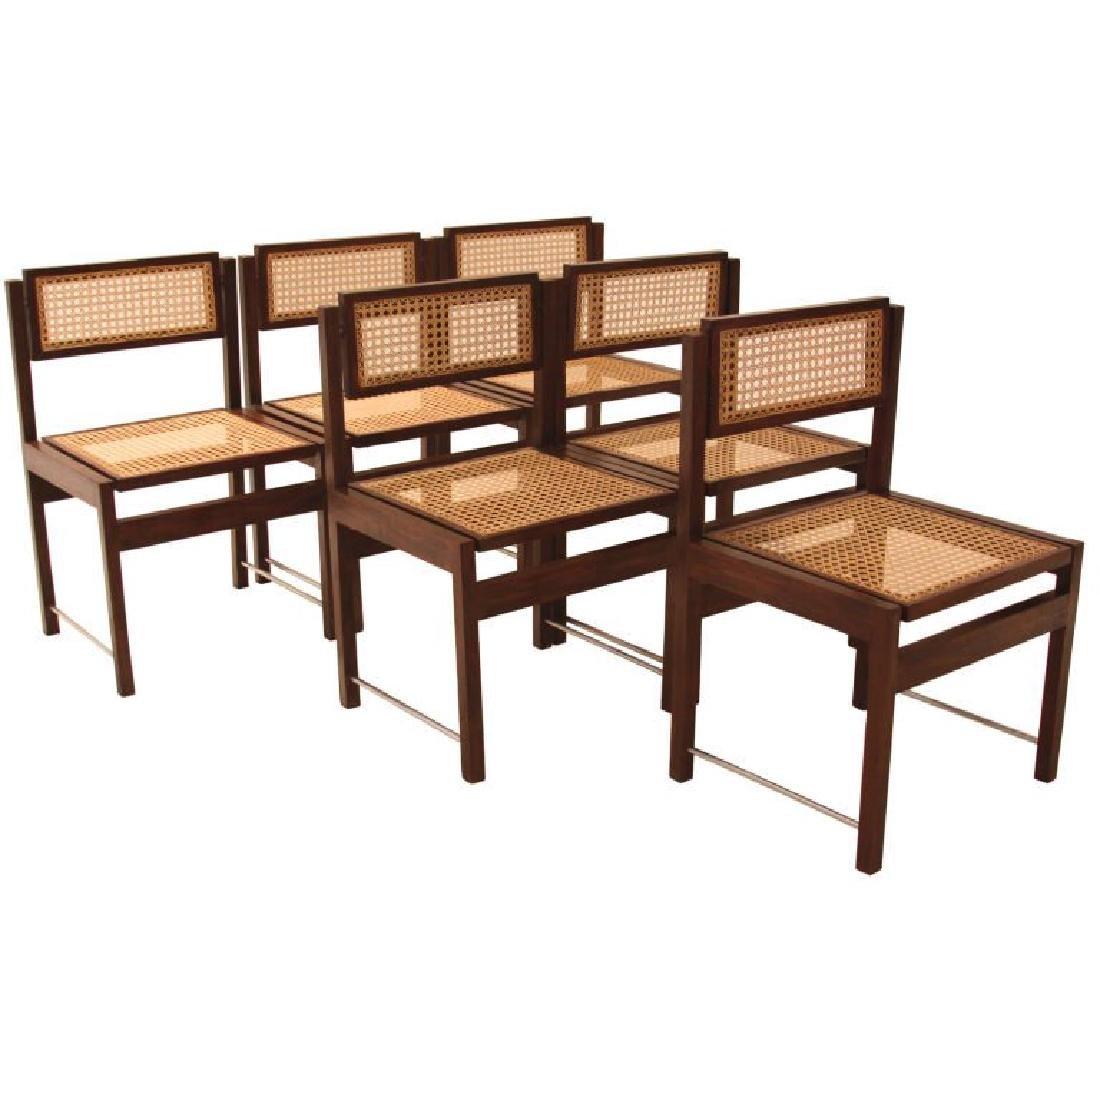 Brazilian Hardwood Swivel Back Dining Chairs (6)